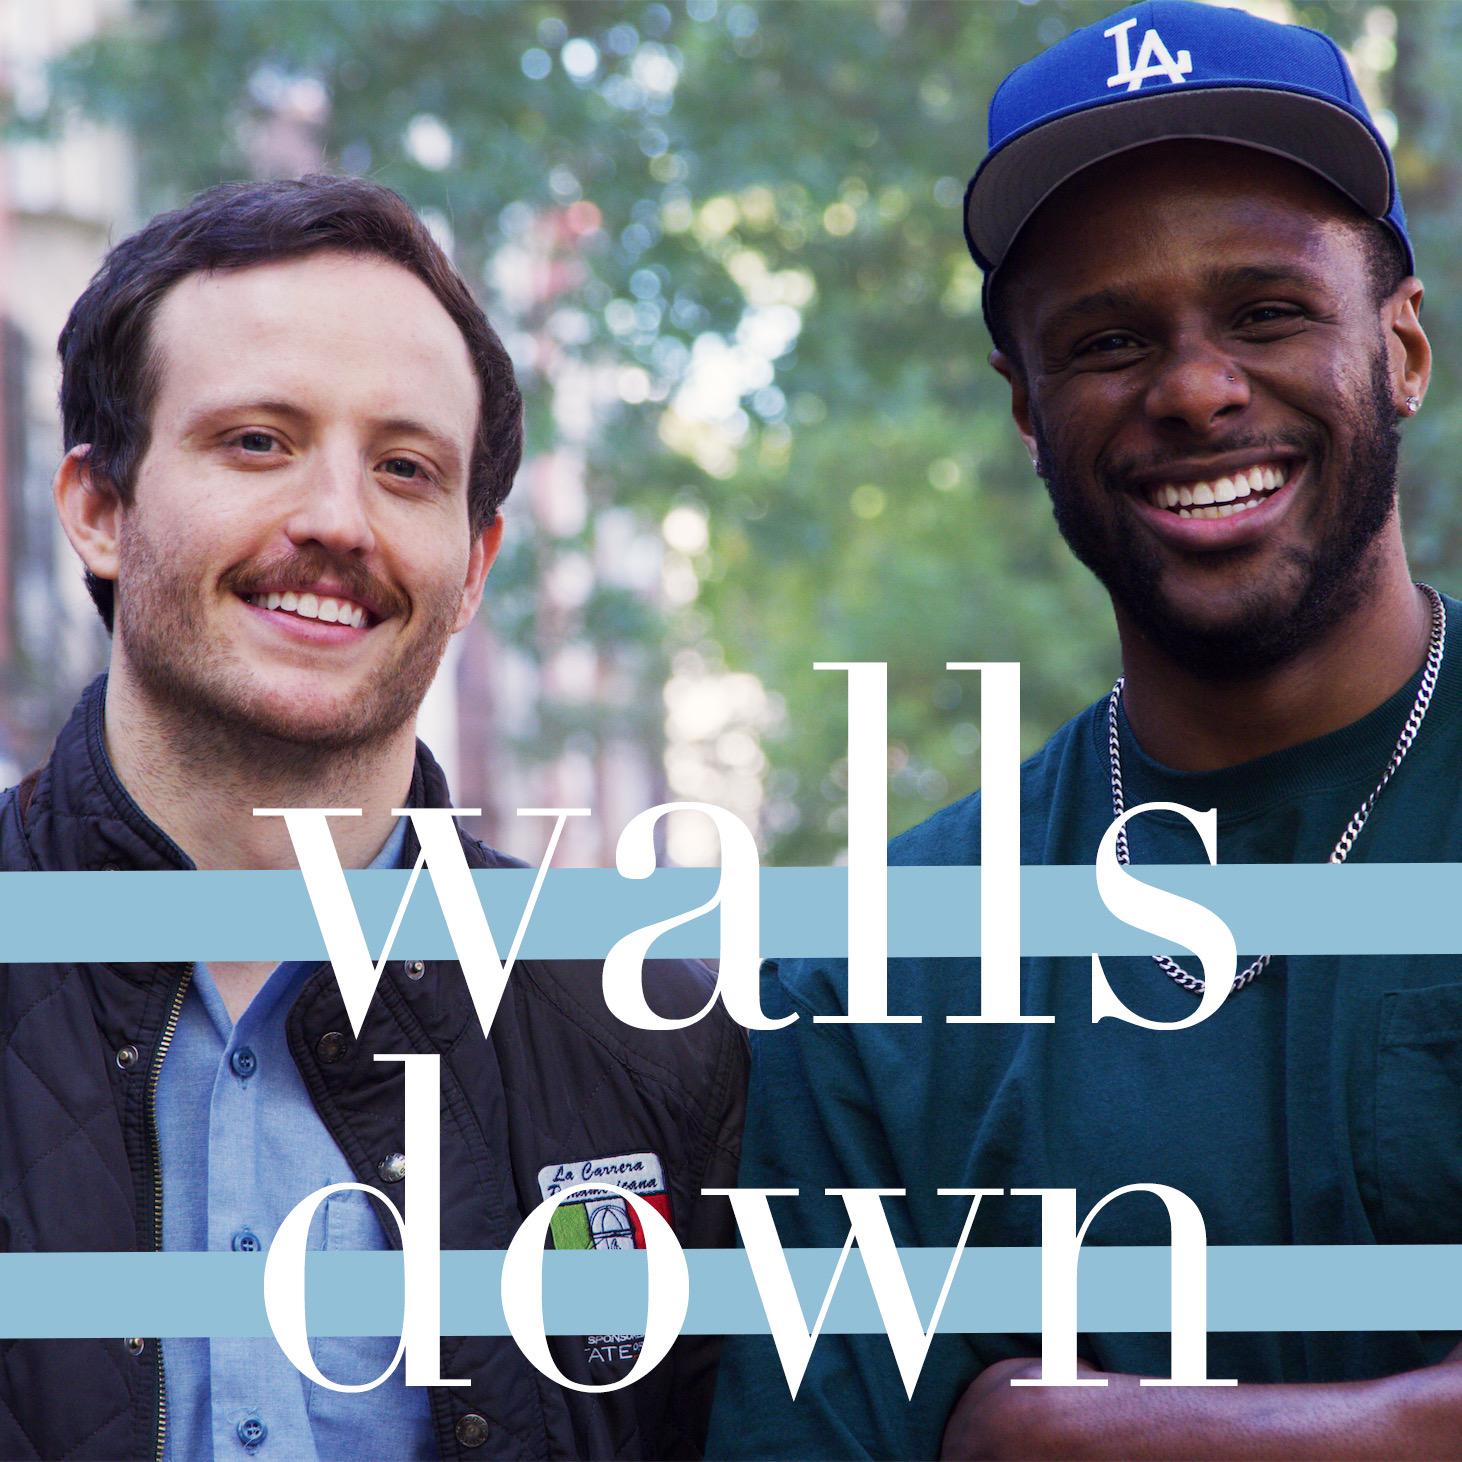 wallsdownpodcast